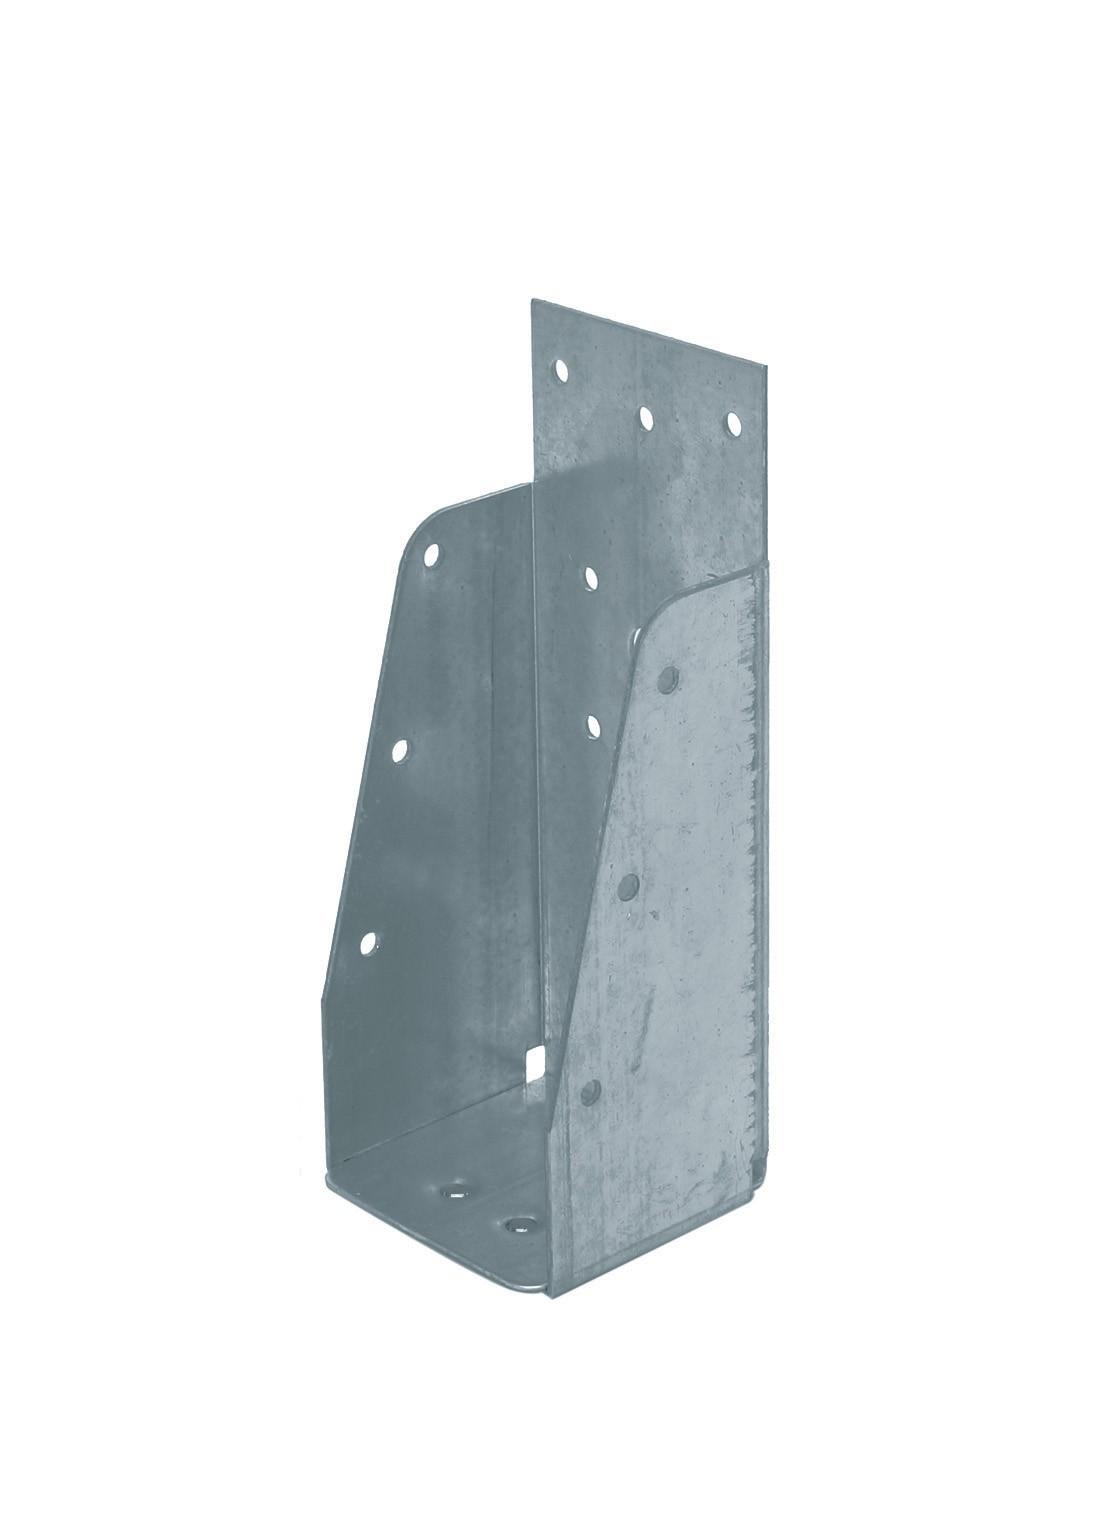 Joist hanger GBS-ZL 71x221 1,5 SV